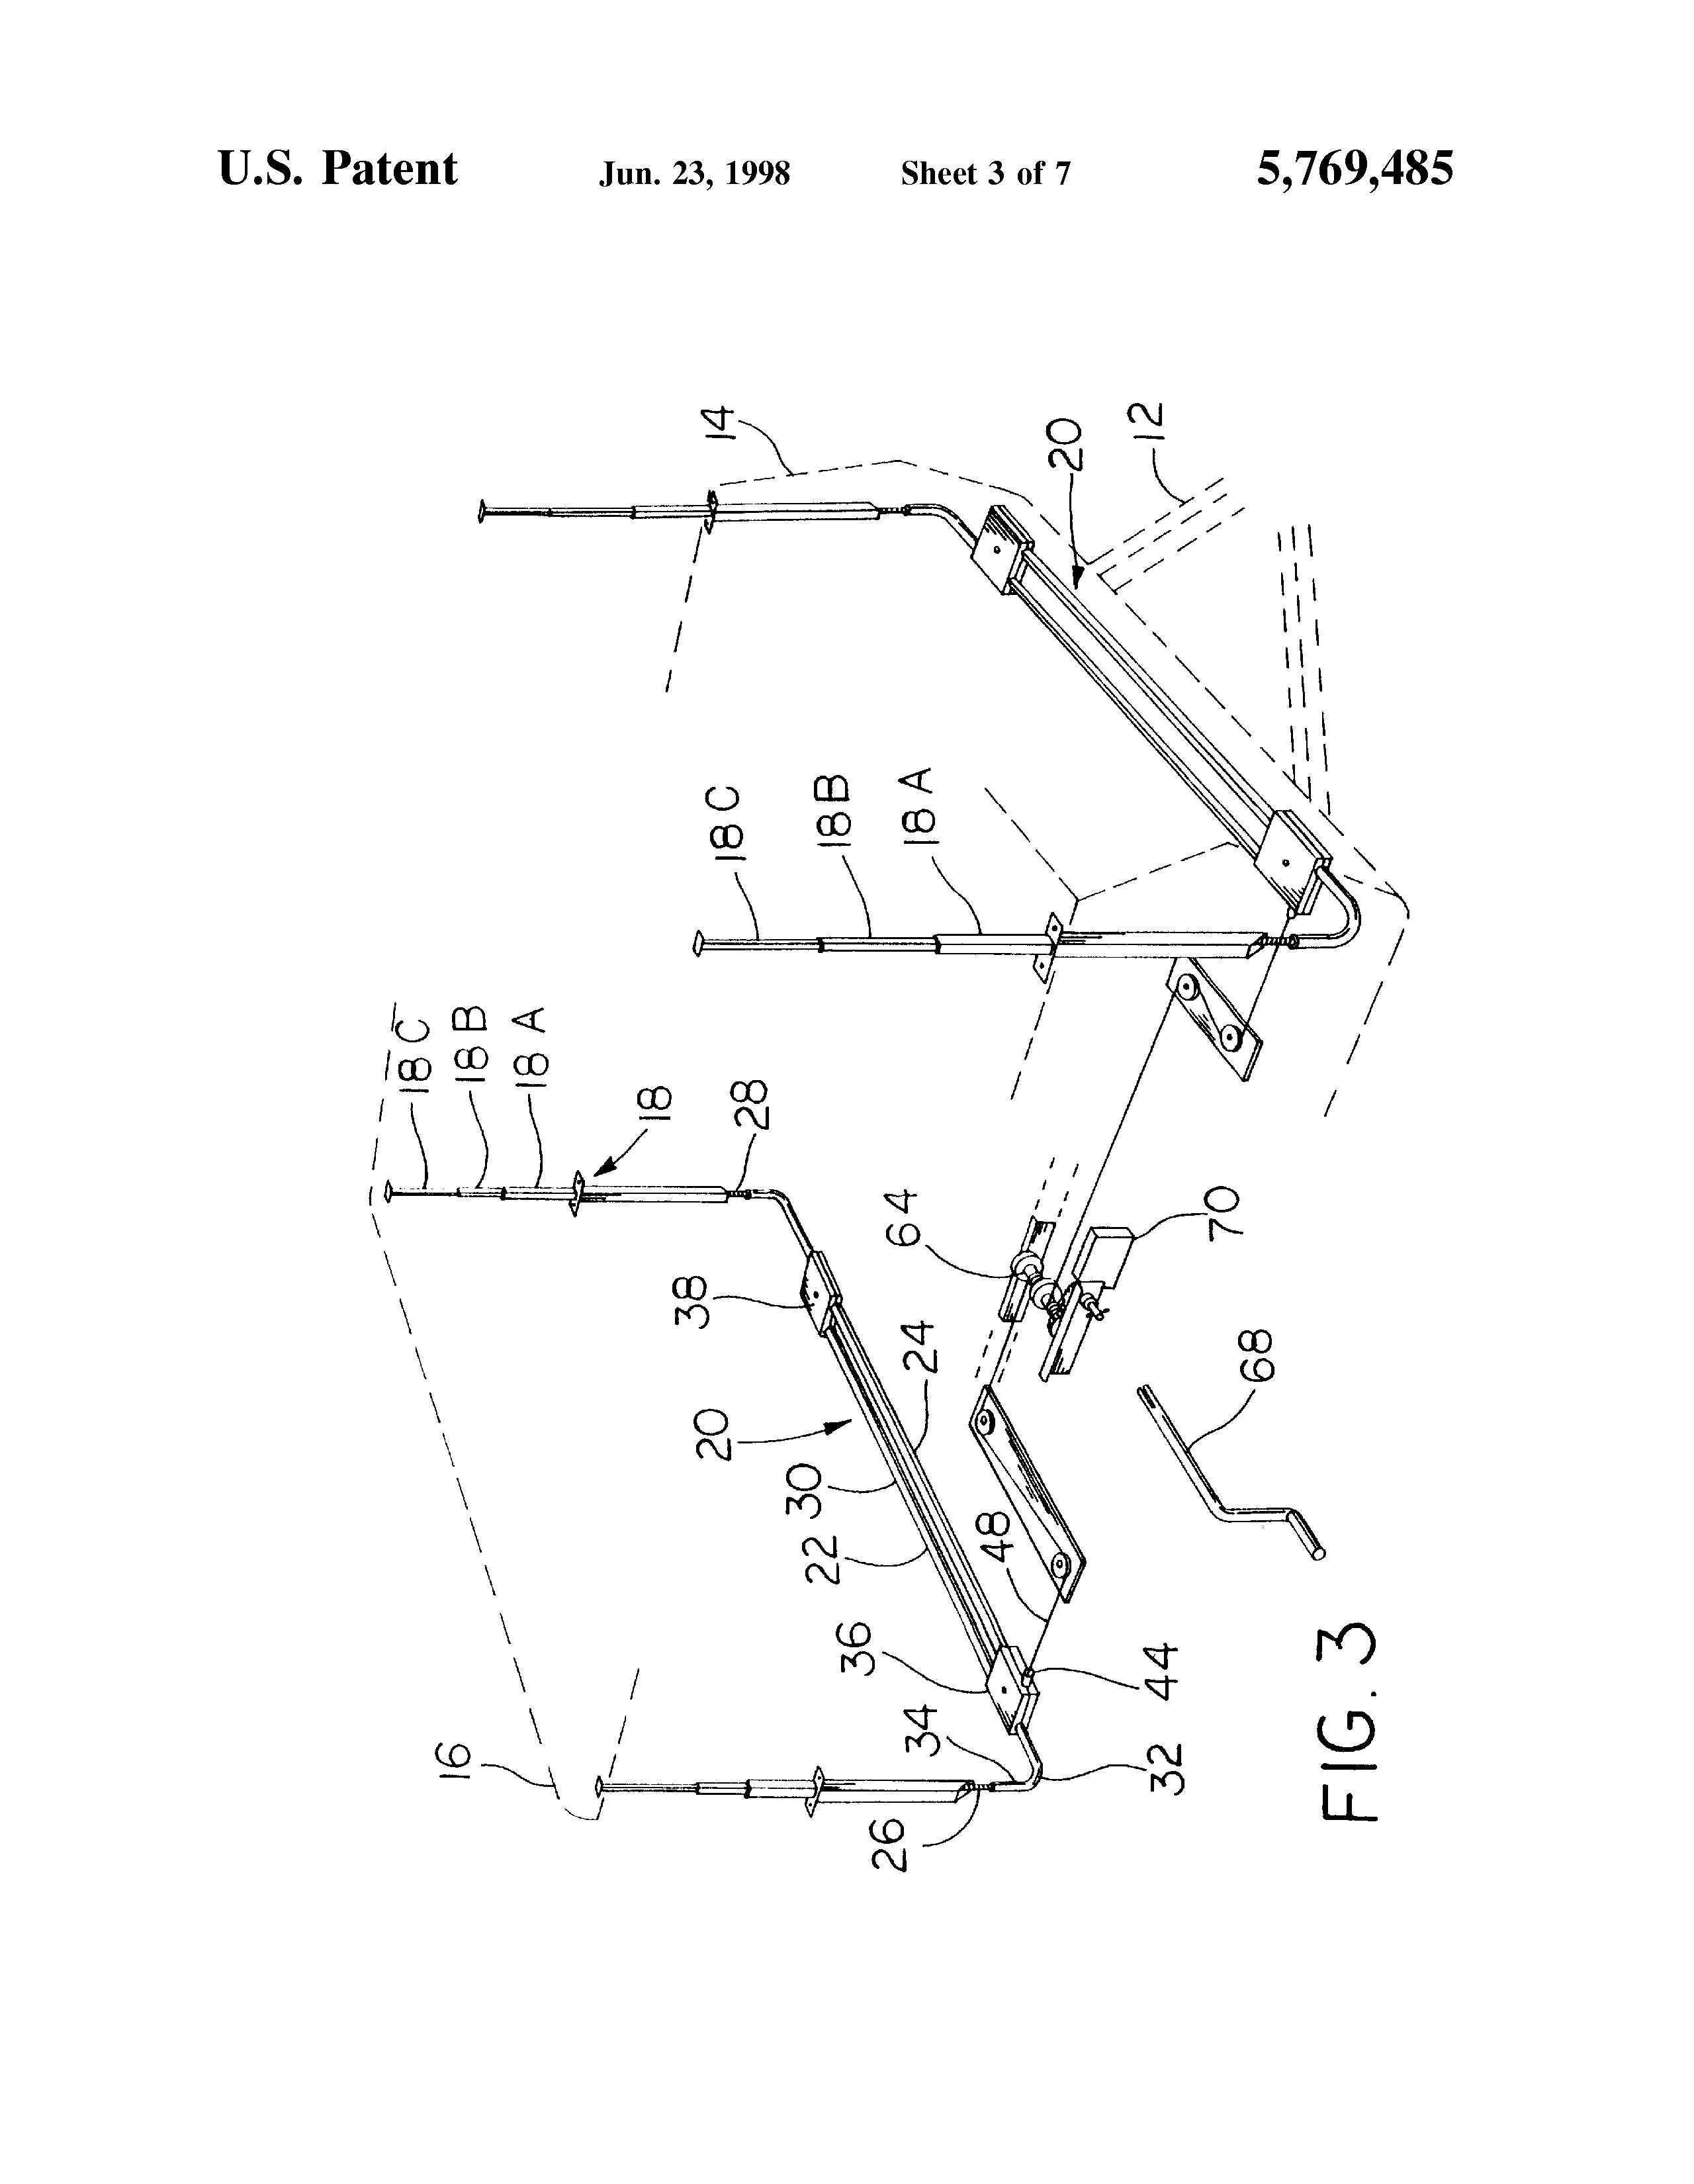 Wiring Diagram For Jayco Camper